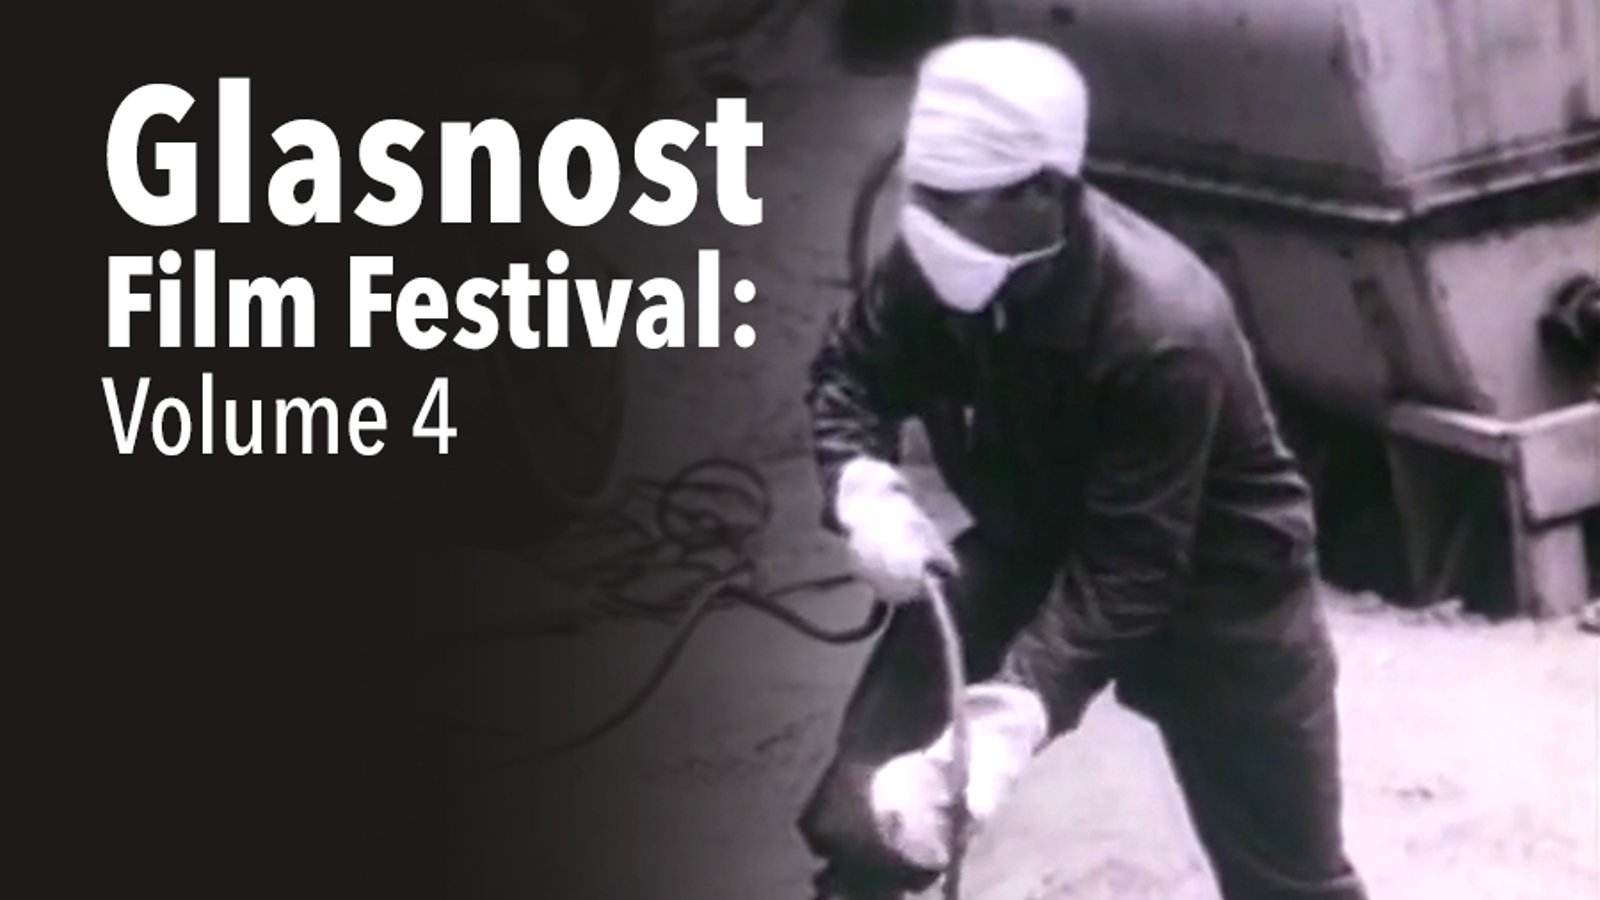 Glasnost Film Festival - Volume 4